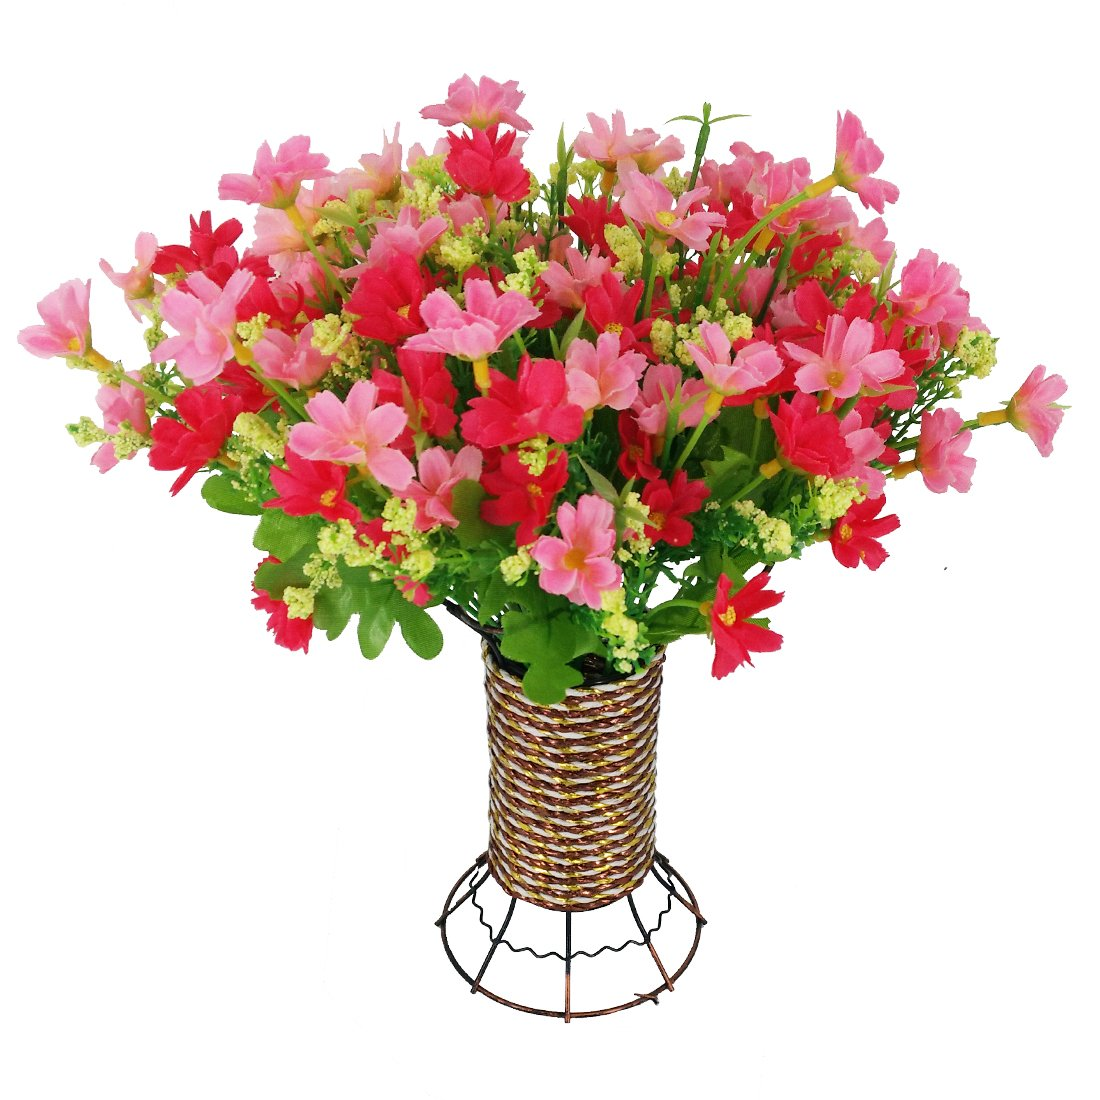 garwarmのセット4 bunches Lifelike Natureモダンデザイン装飾人工フェイクTabletop Cineraria Flower with Ironプランターポット花瓶ホームオフィス装飾(ローズレッドとピンク) LJ-FZH-026 B01NACKMVF  Pink Cineraria